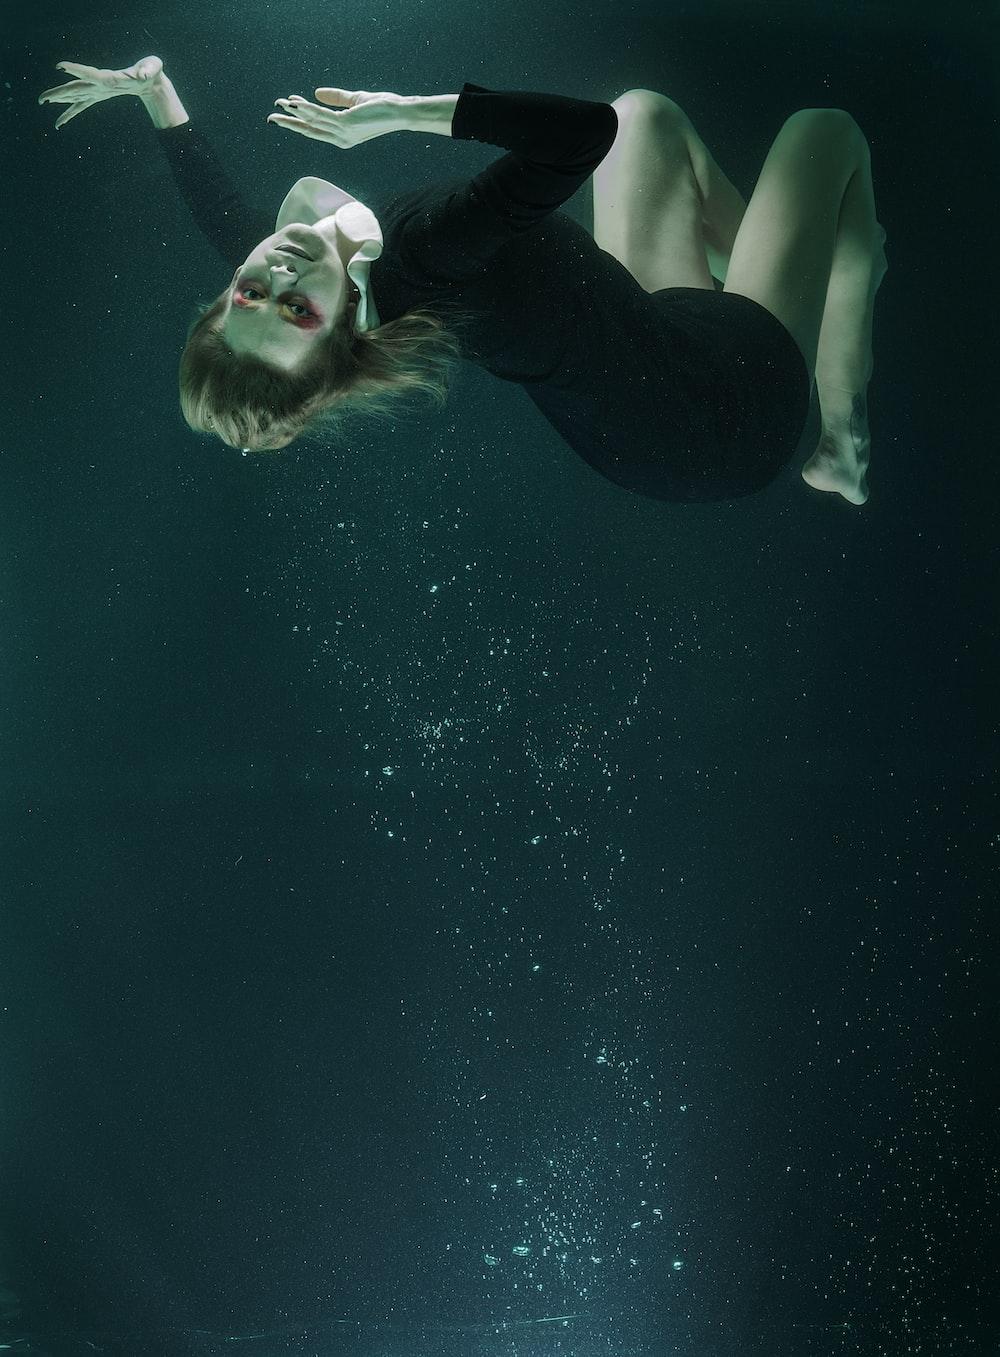 woman in black tank top and black pants under water